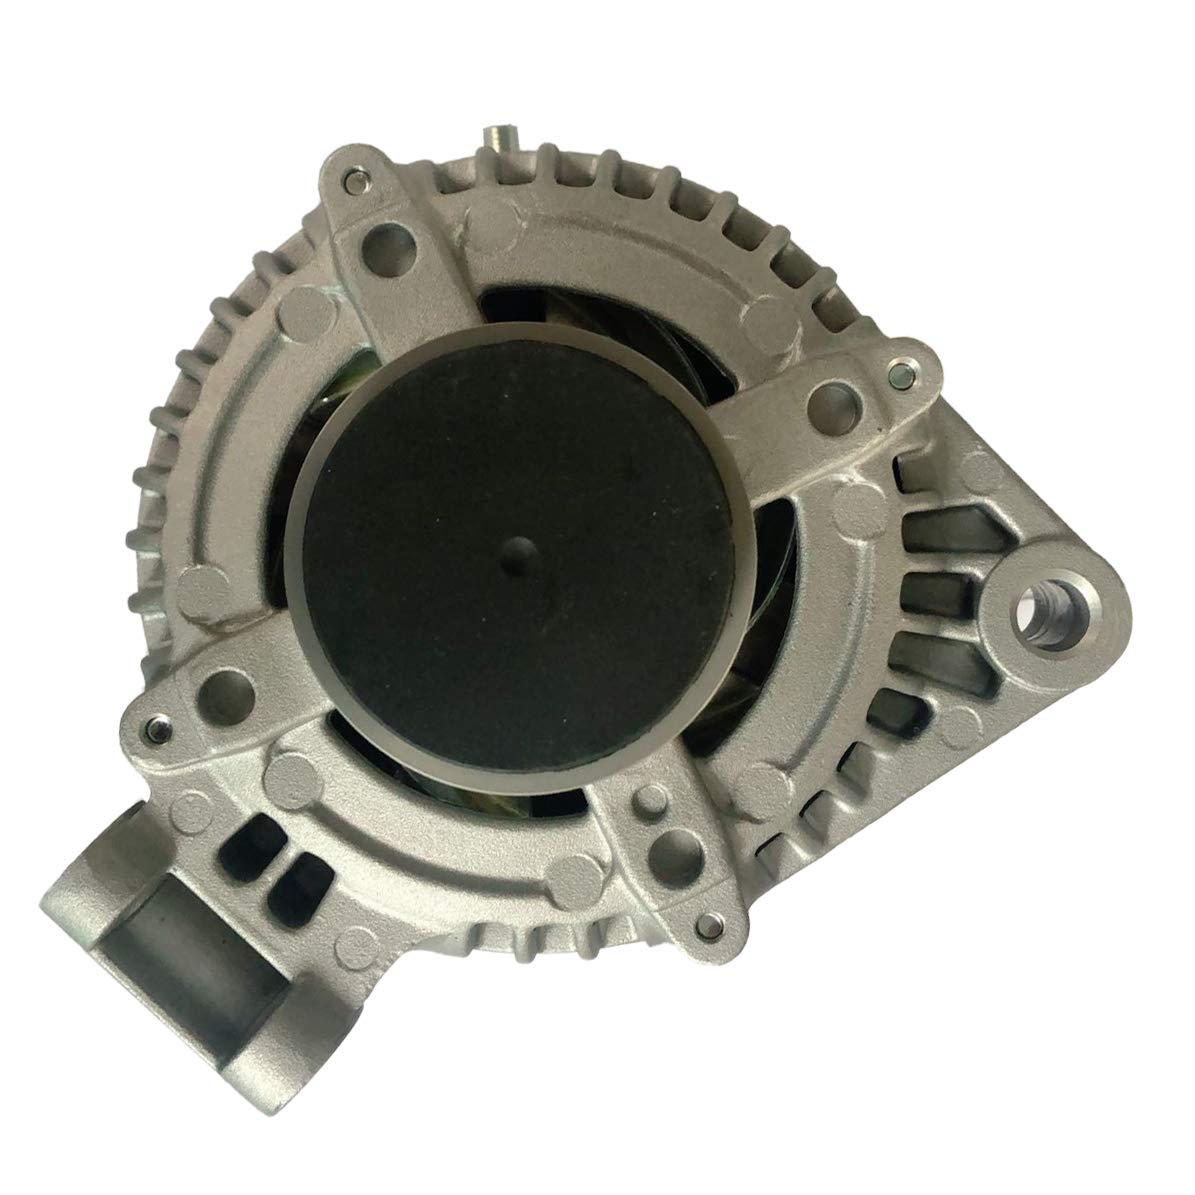 Alternateur 12V 150A pour 2.7TD 4x4 LRA03028 YLE500200 LRA02741